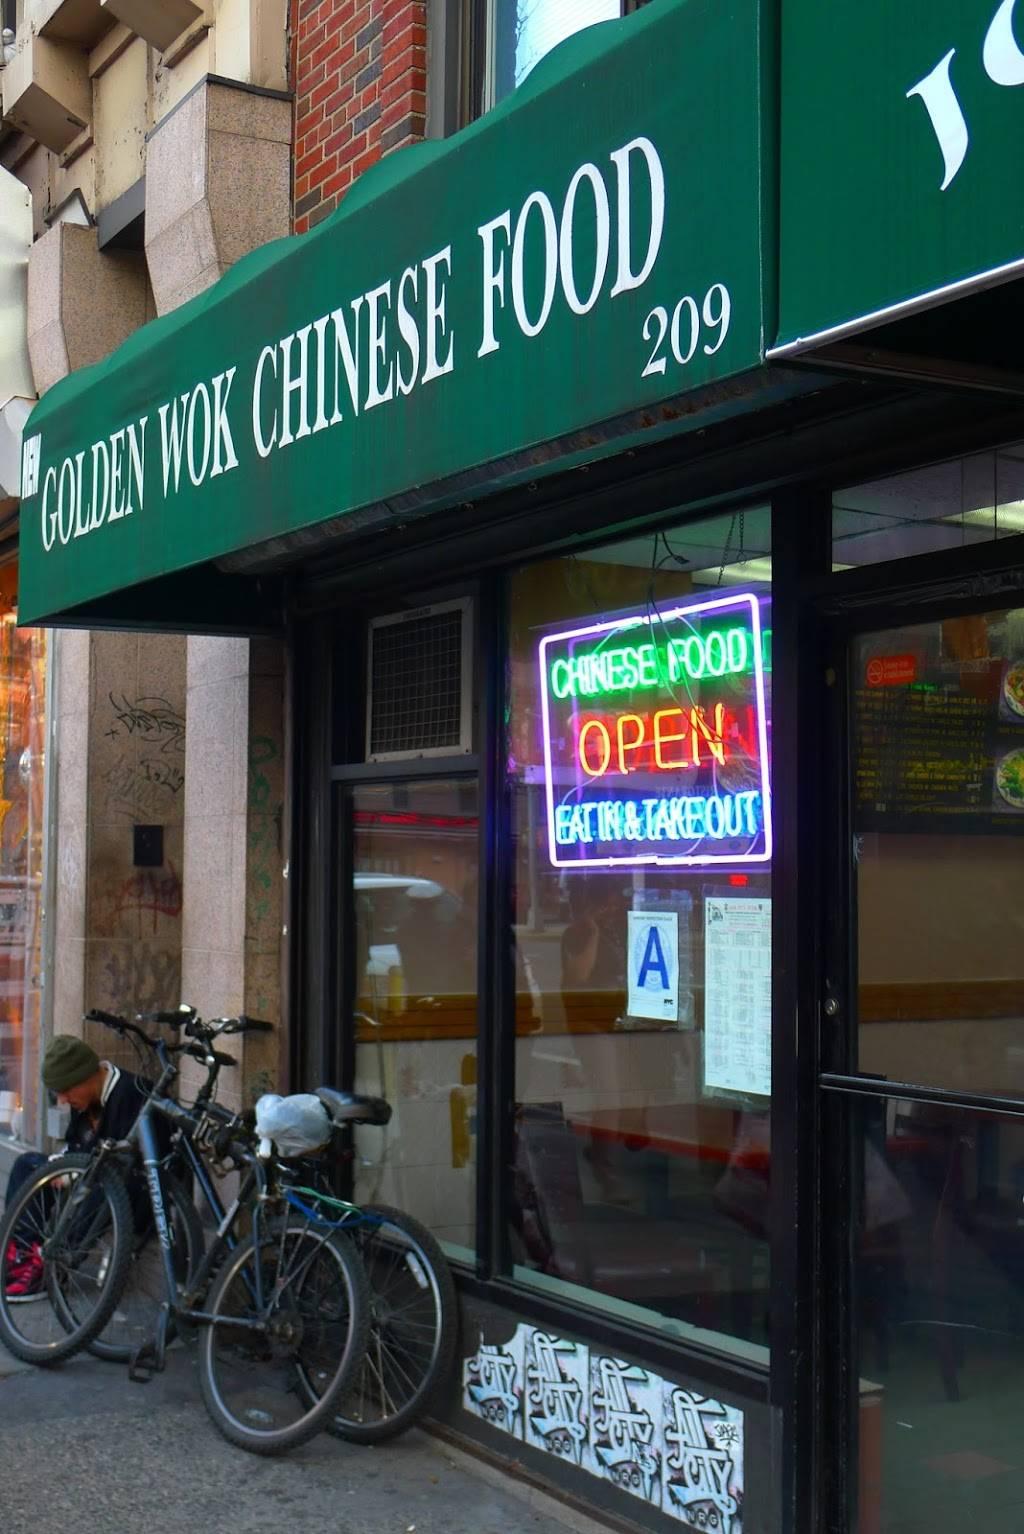 Chelsea Golden Wok | restaurant | 209 8th Ave, New York, NY 10011, USA | 2126200712 OR +1 212-620-0712